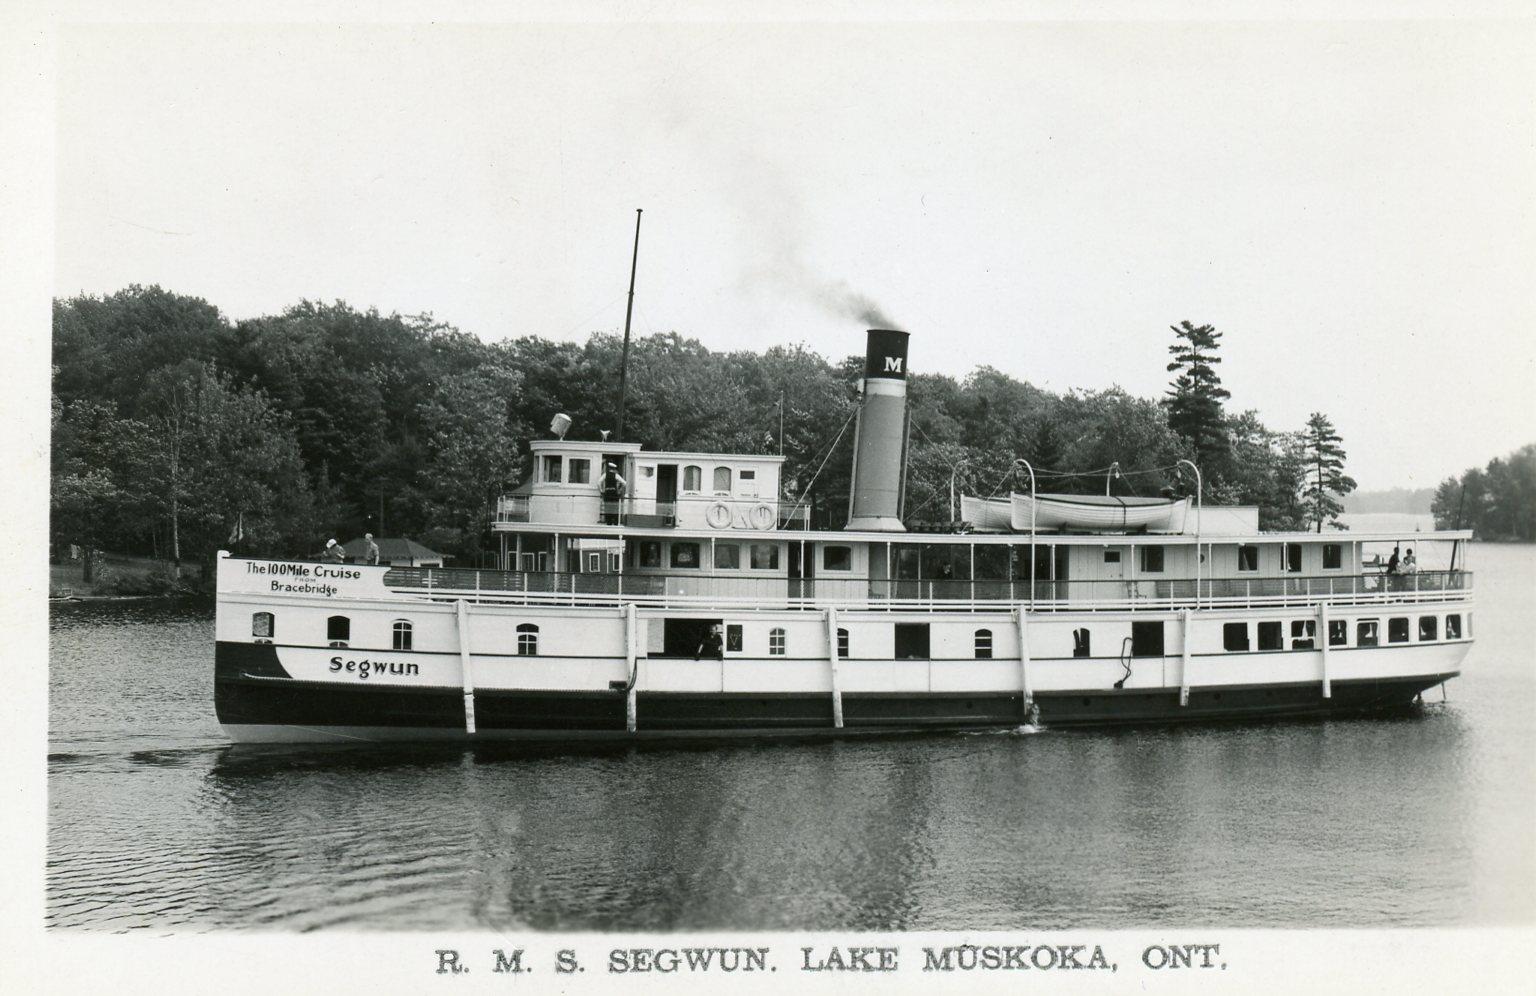 R.M.S. Segwun. Lake Muskoka, ONT.